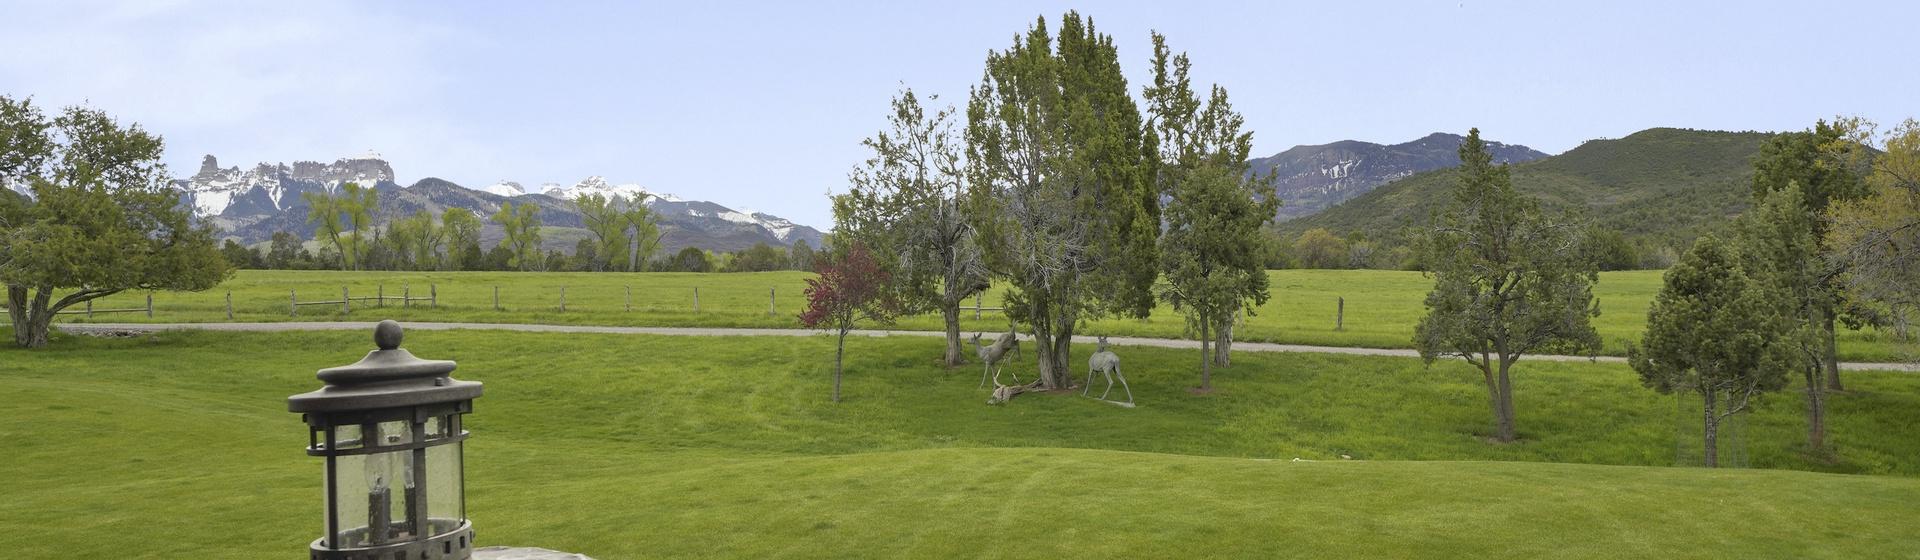 13.9-Telluride-Sleeping-Indian-Ranch-view-3-web.JPG